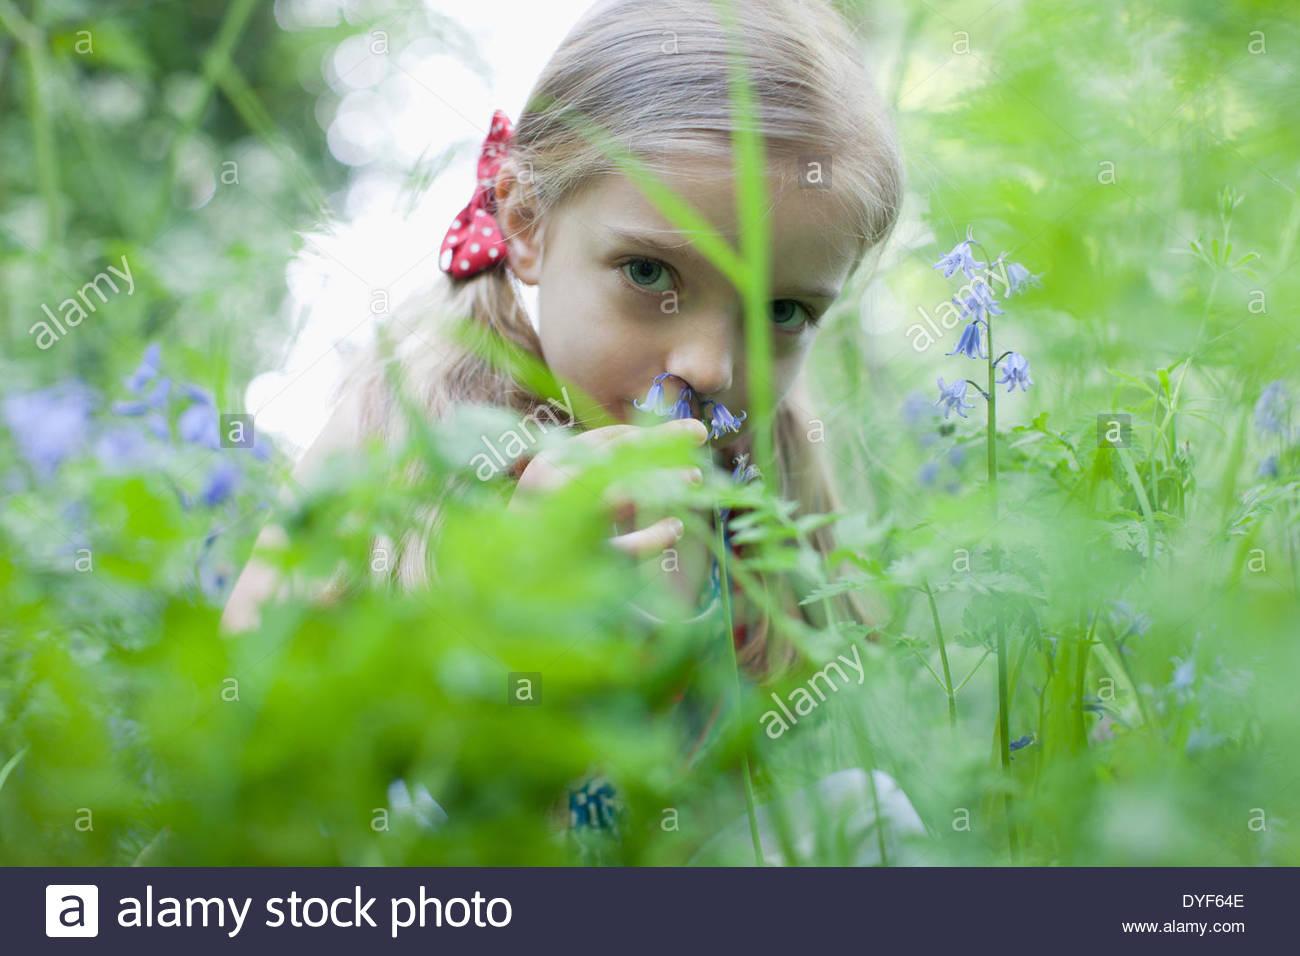 Girl picking wildflowers - Stock Image